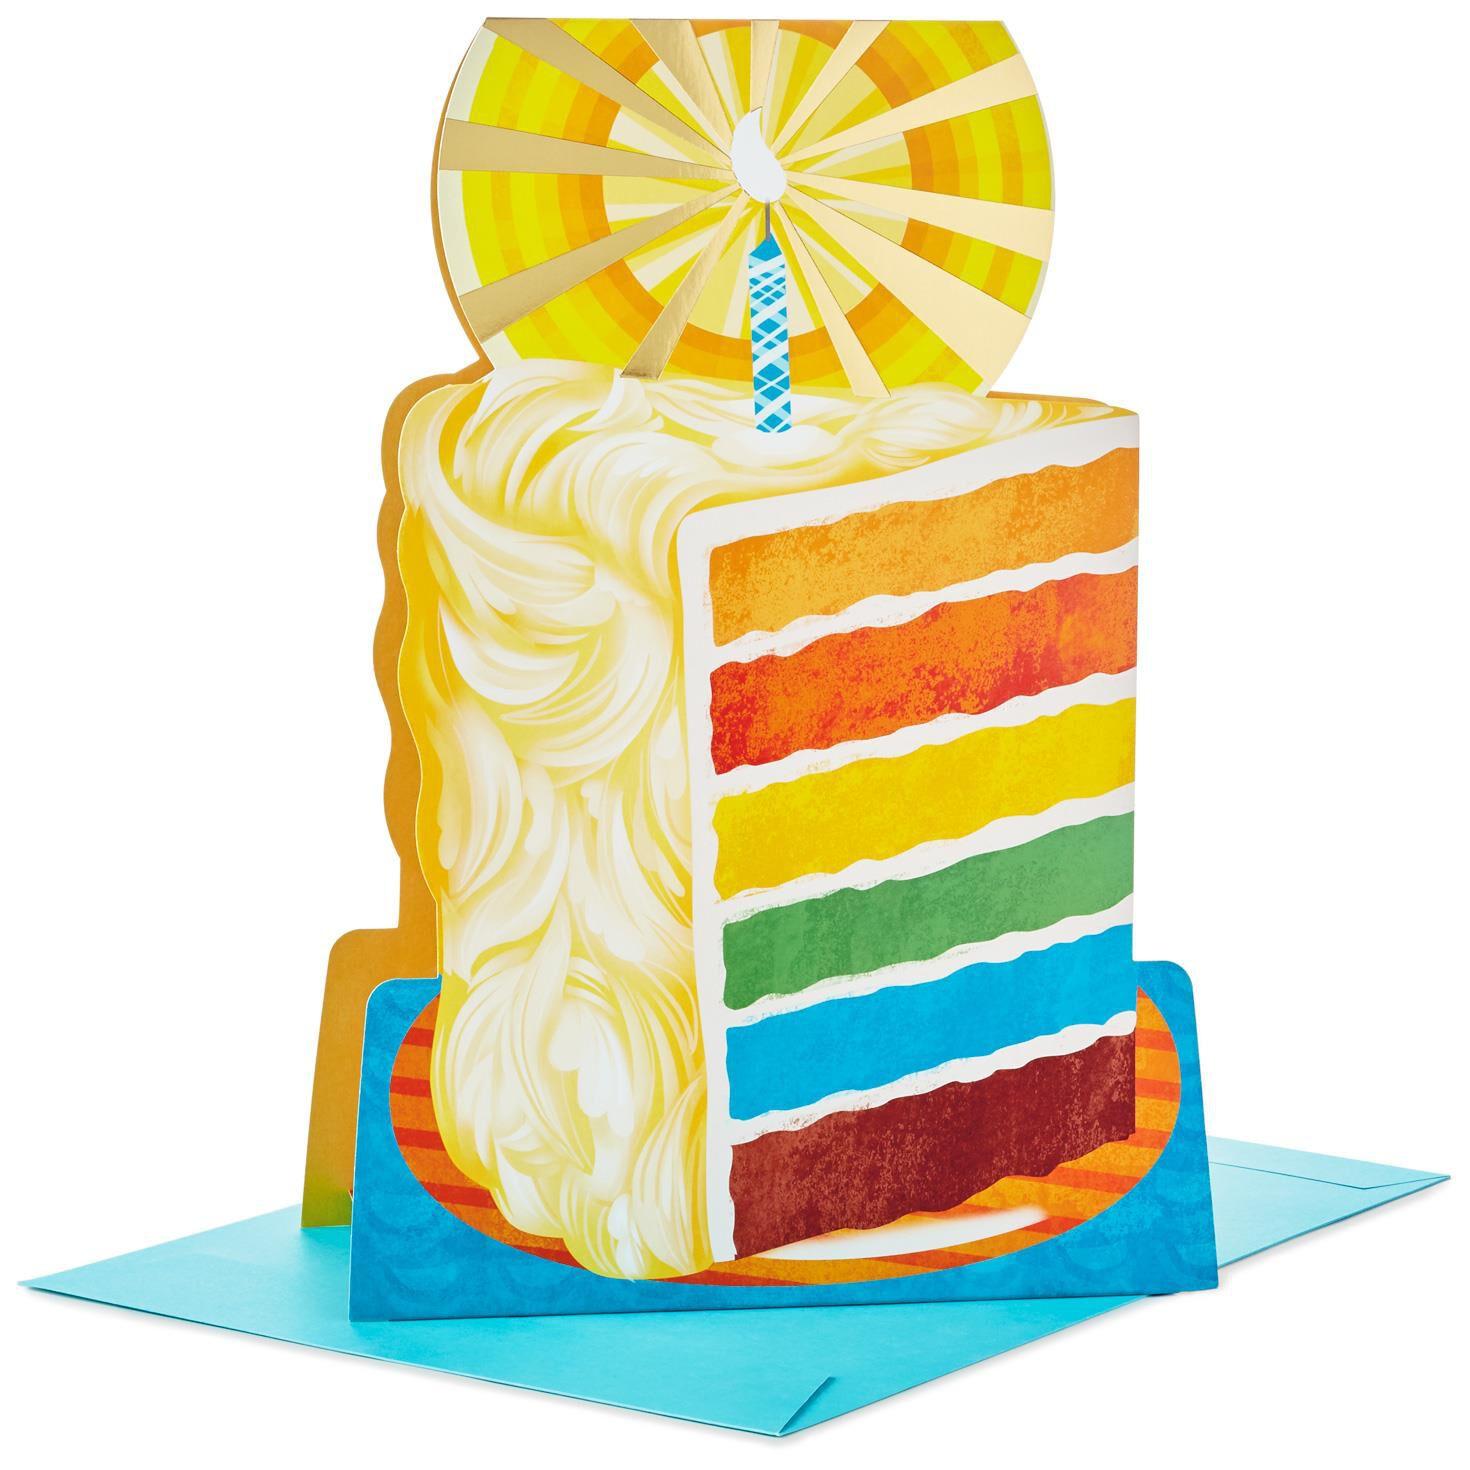 "Slice of Cake Stand Up Jumbo Birthday Card 16"" Greeting Cards"